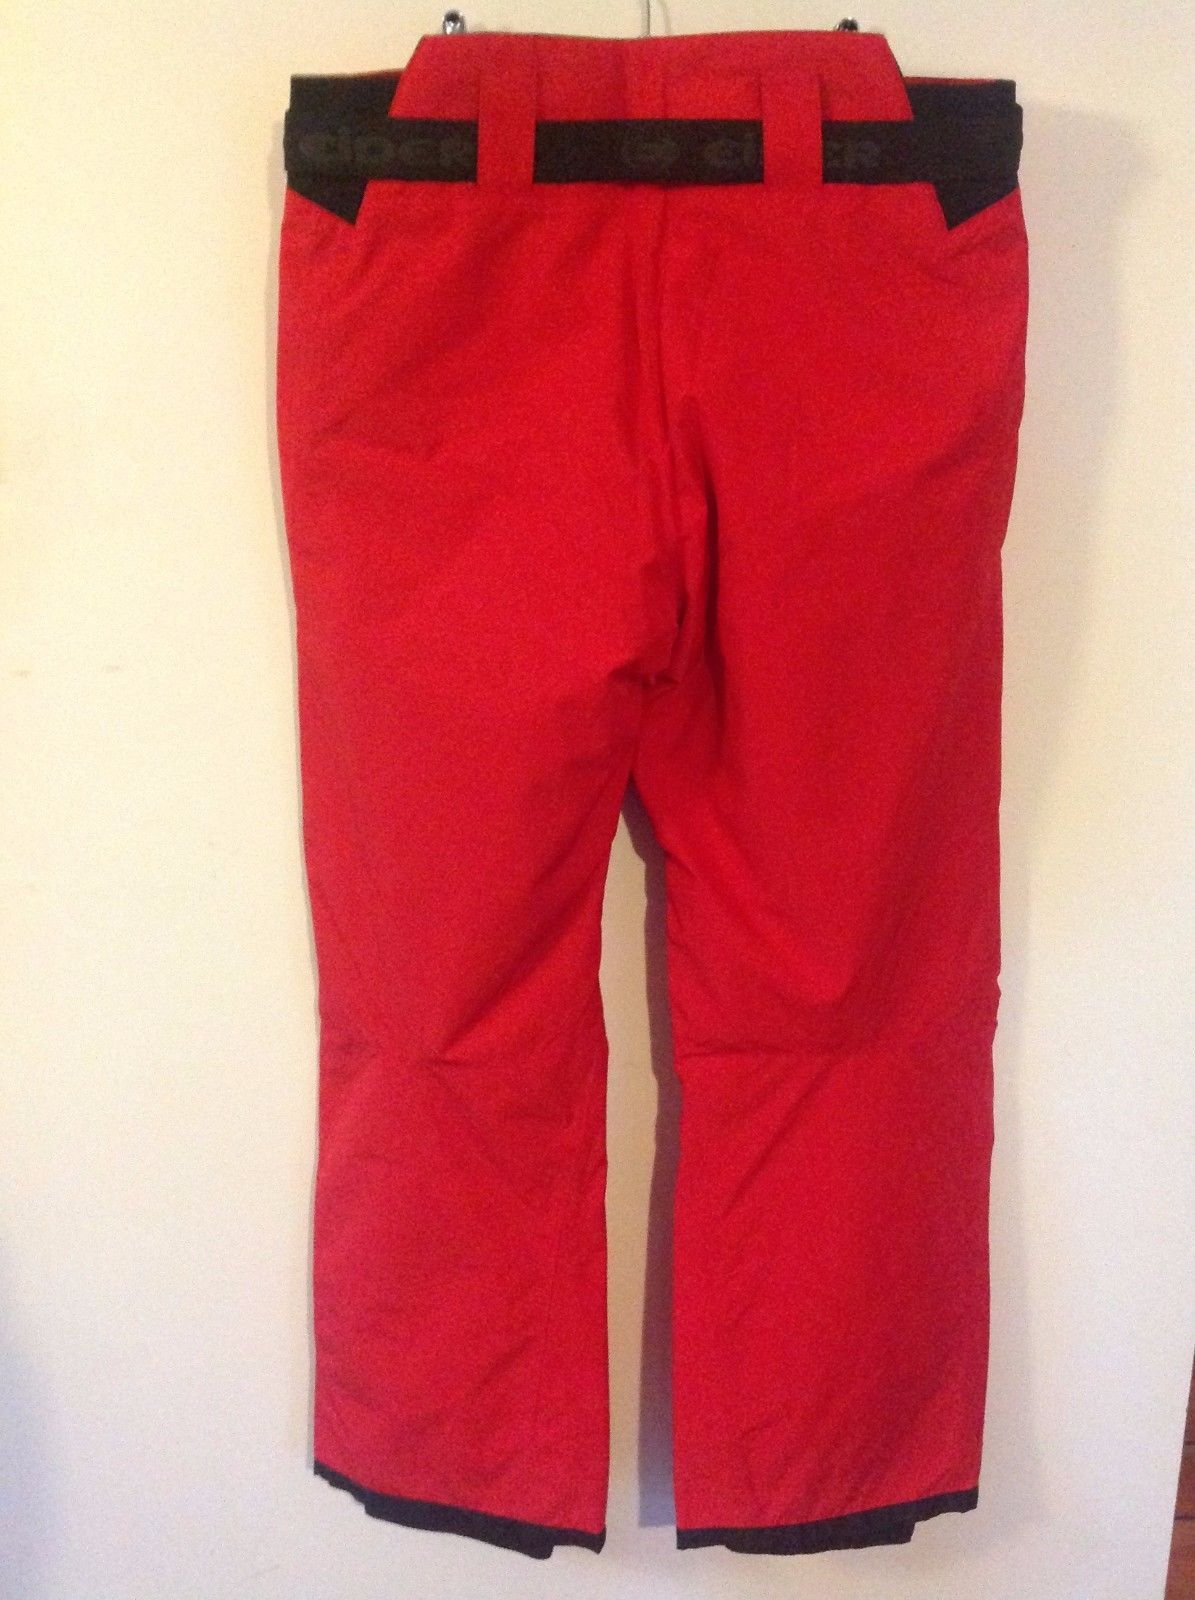 Eider Defender Fiery Red Alta Badia Ski Snowsport Trousers Pants  2XL £135  BNWT